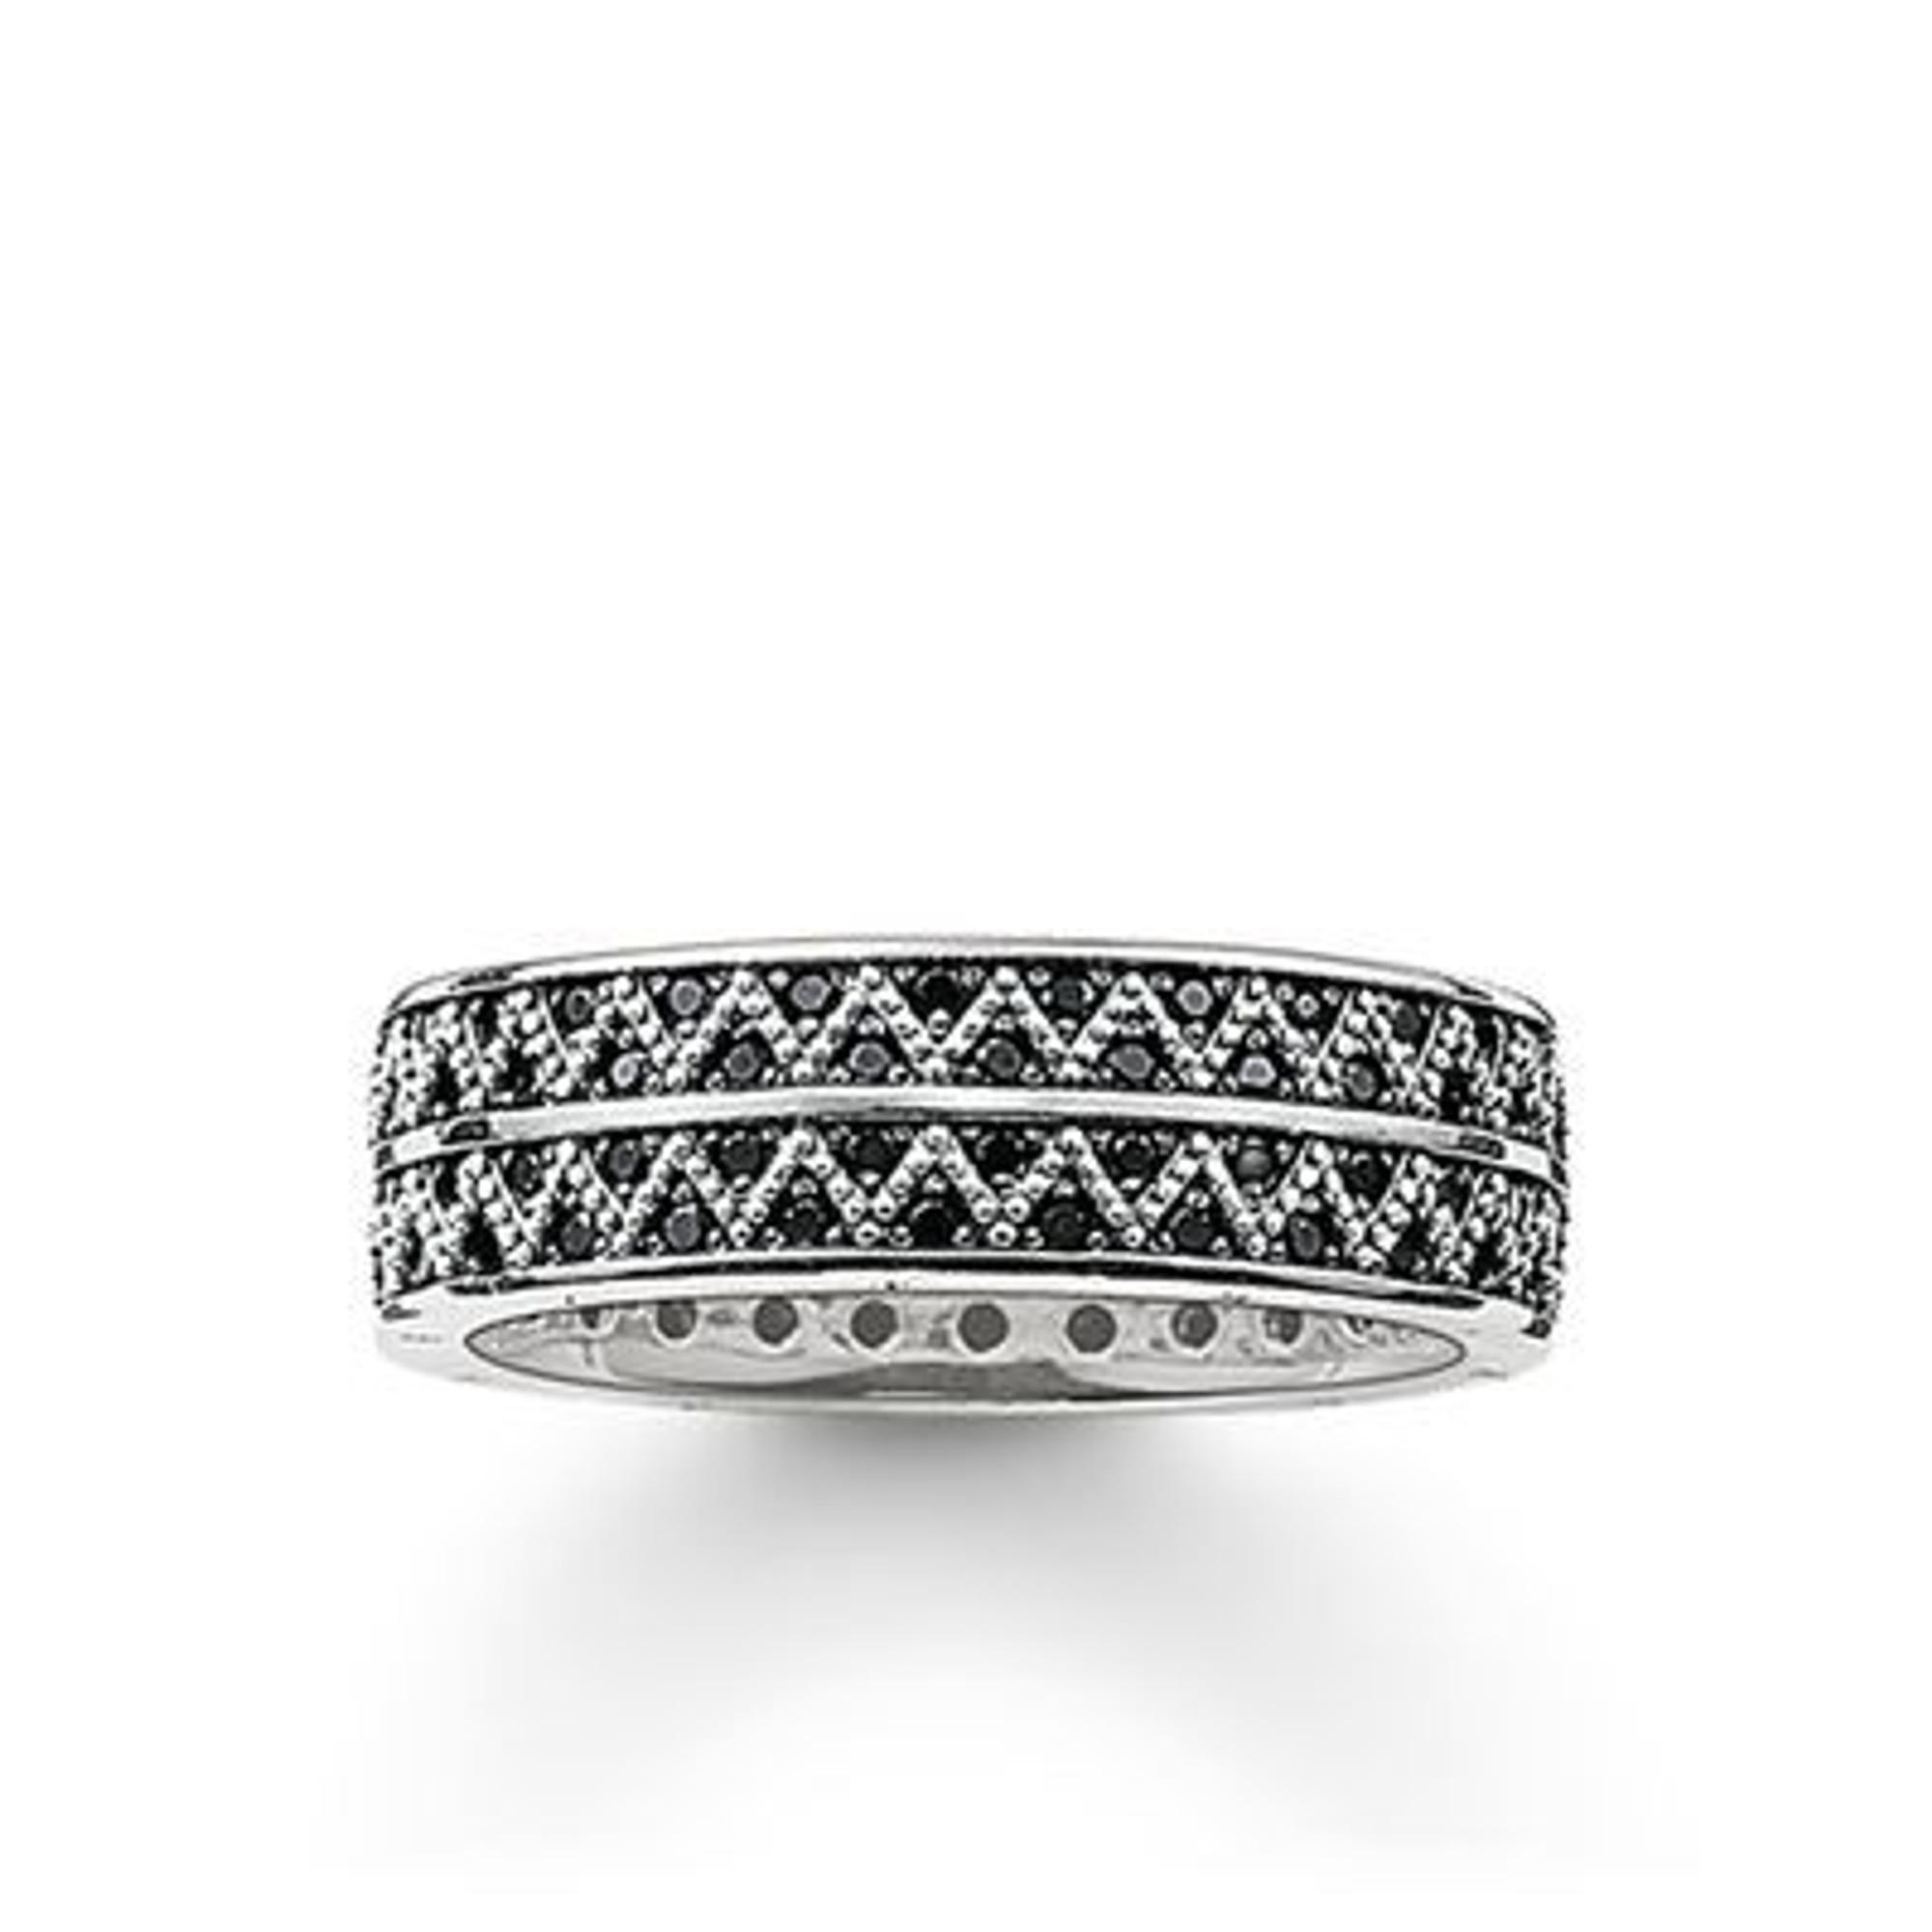 THOMAS SABO Ring TR2051-643-11-54